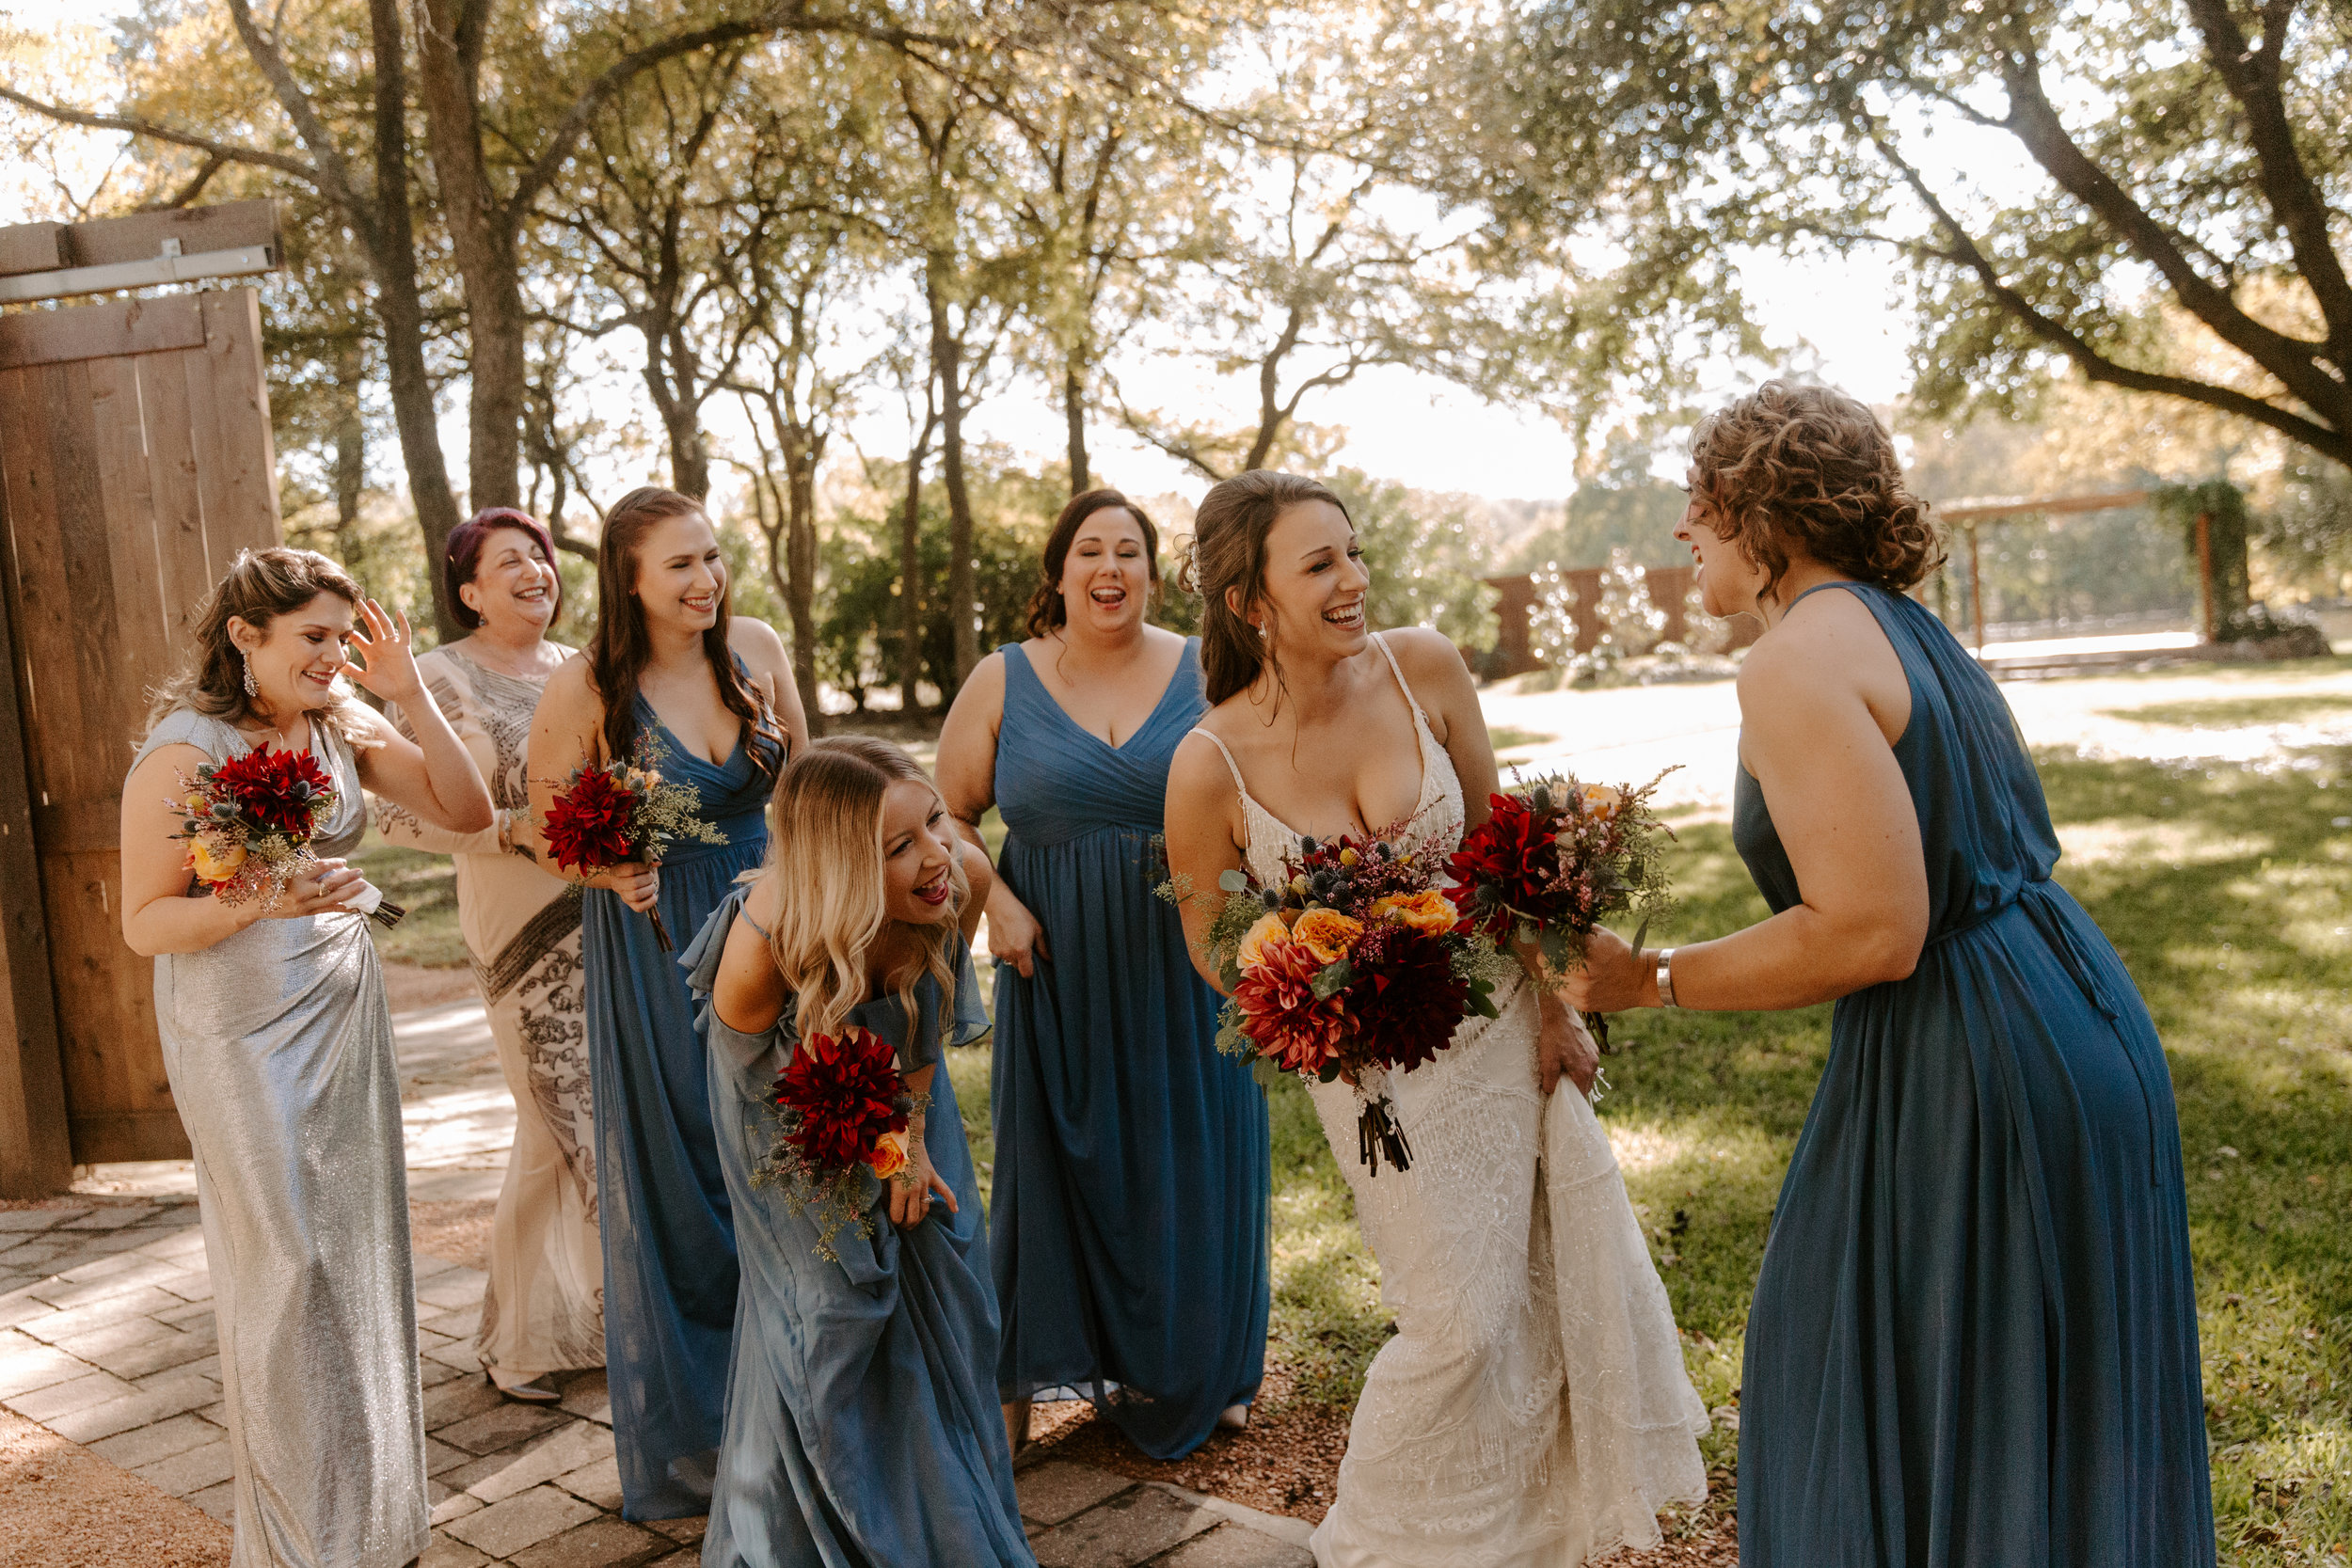 Worley Wedding - Arden and Eric - Wedding Photos - Sneak Peek -Meme Urbane Photography_-9.jpg